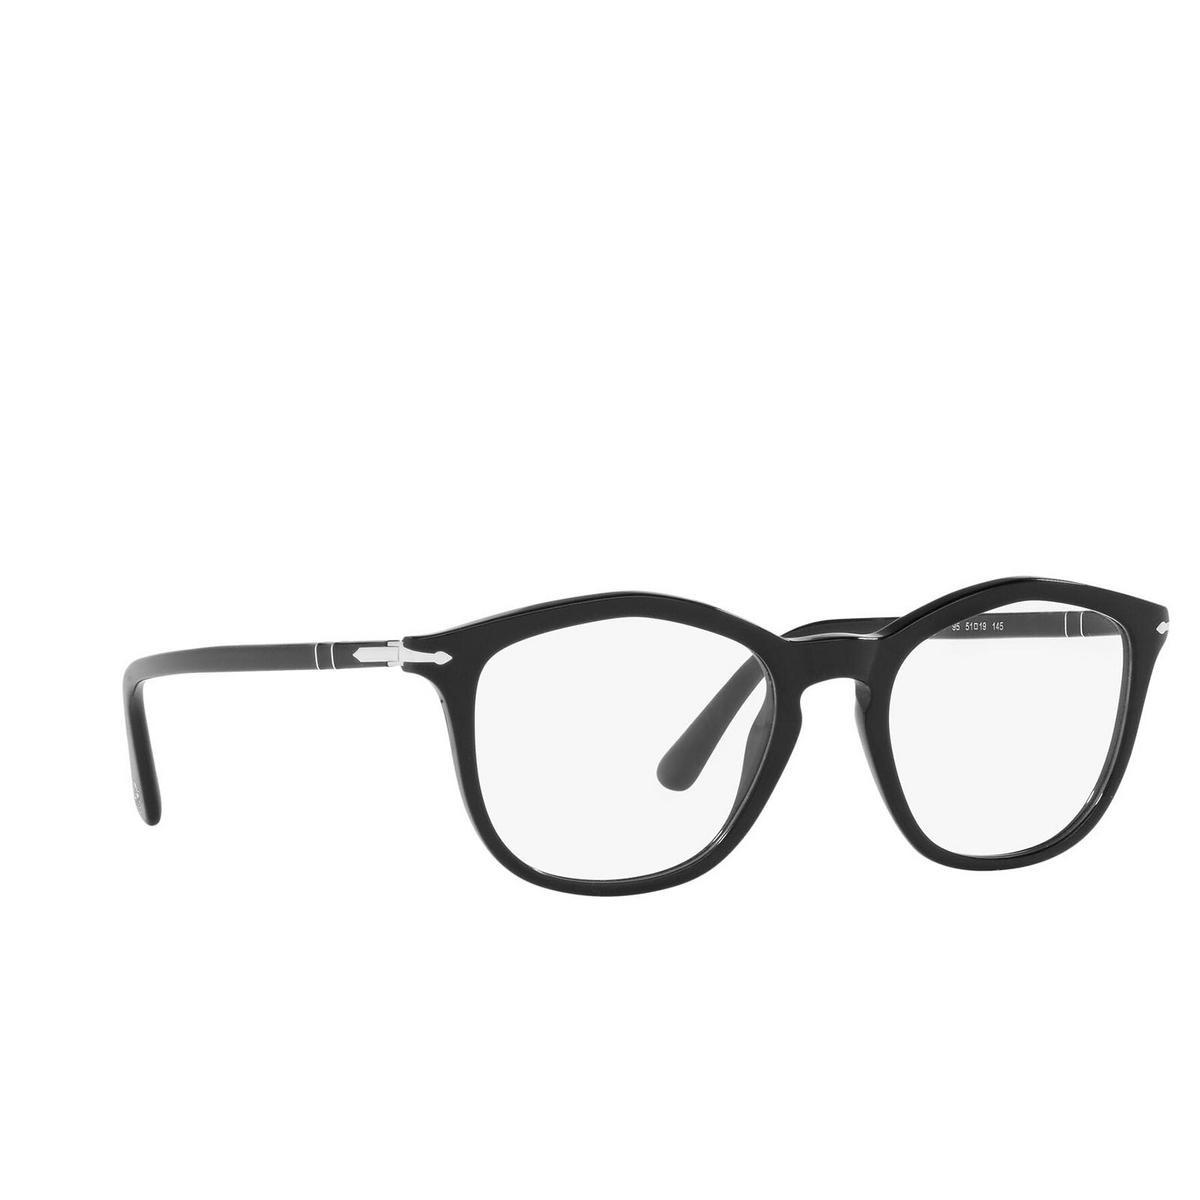 Persol® Irregular Eyeglasses: PO3267V color Black 95 - three-quarters view.